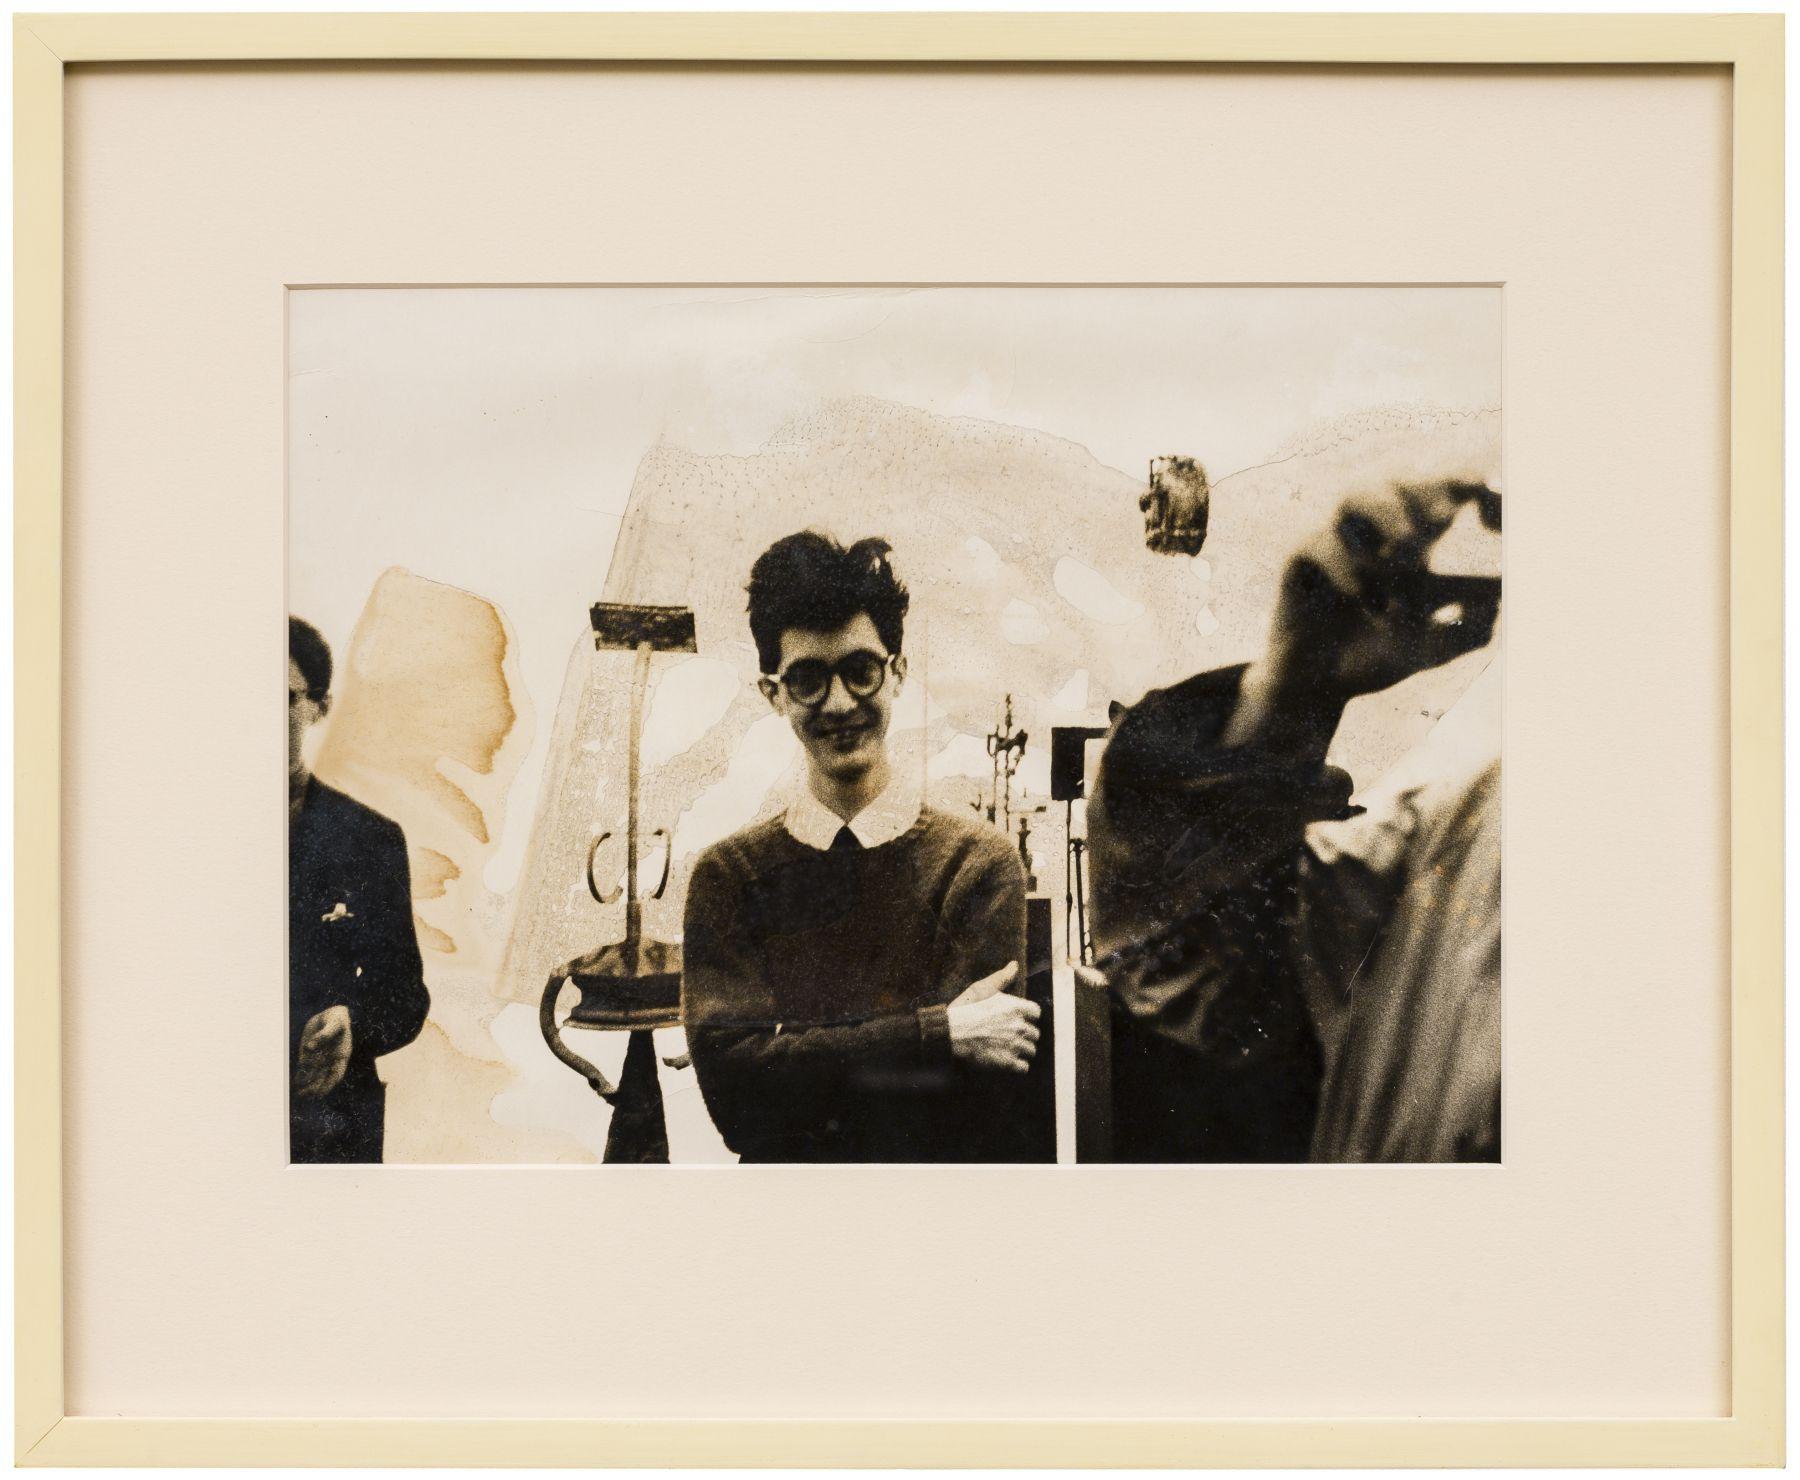 Robert Frank Dick Bellamy at Hansa Gallery